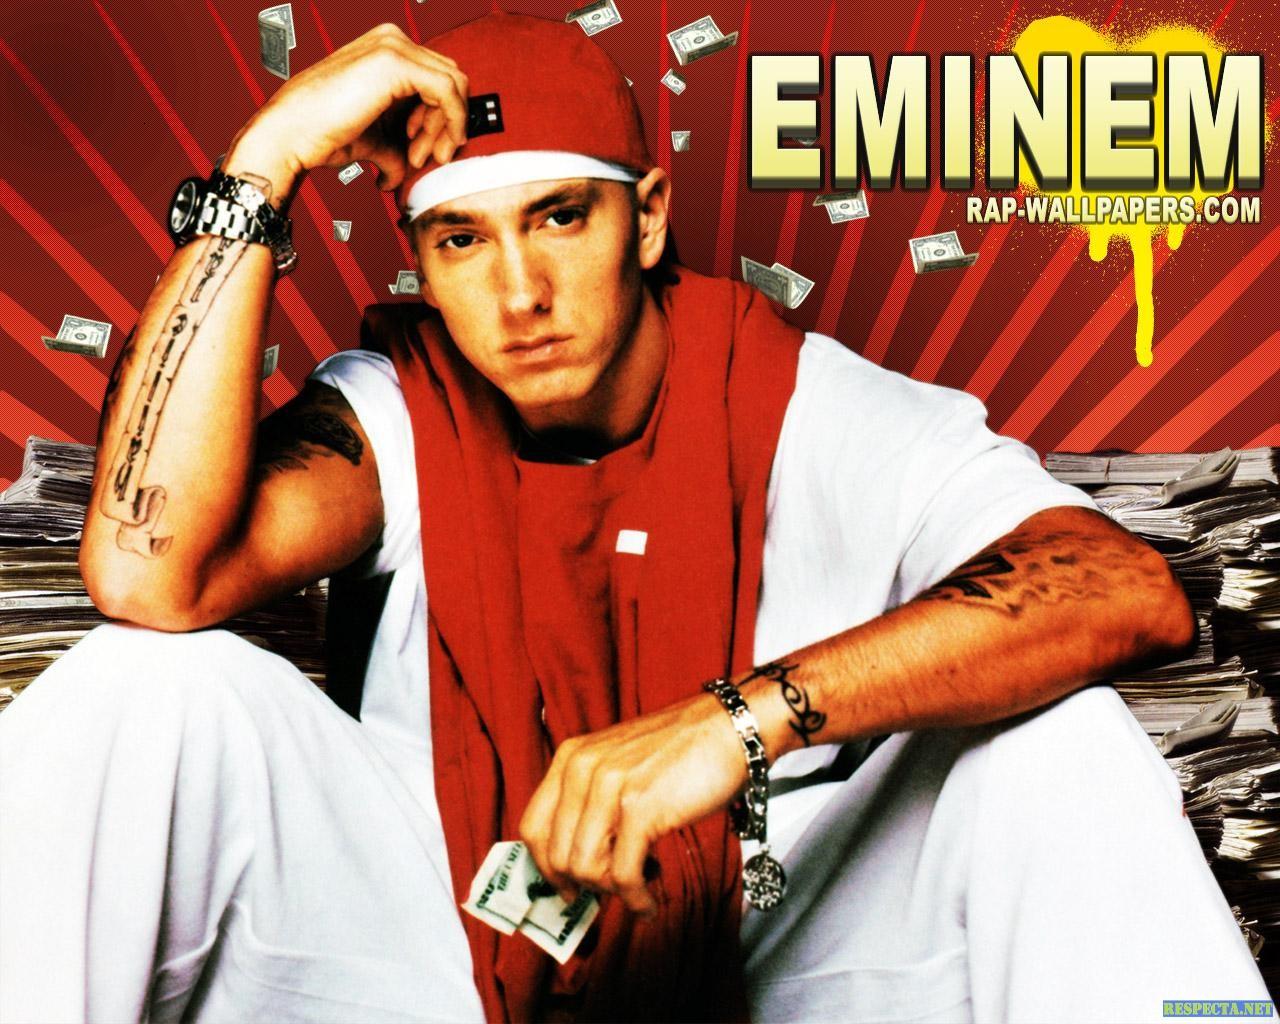 http://4.bp.blogspot.com/-LNaxvZuGppE/Ta3gzXjP4dI/AAAAAAAABqw/oHbH9w4O6Ws/s1600/Eminem%20wallpaper%20%284%29.jpg